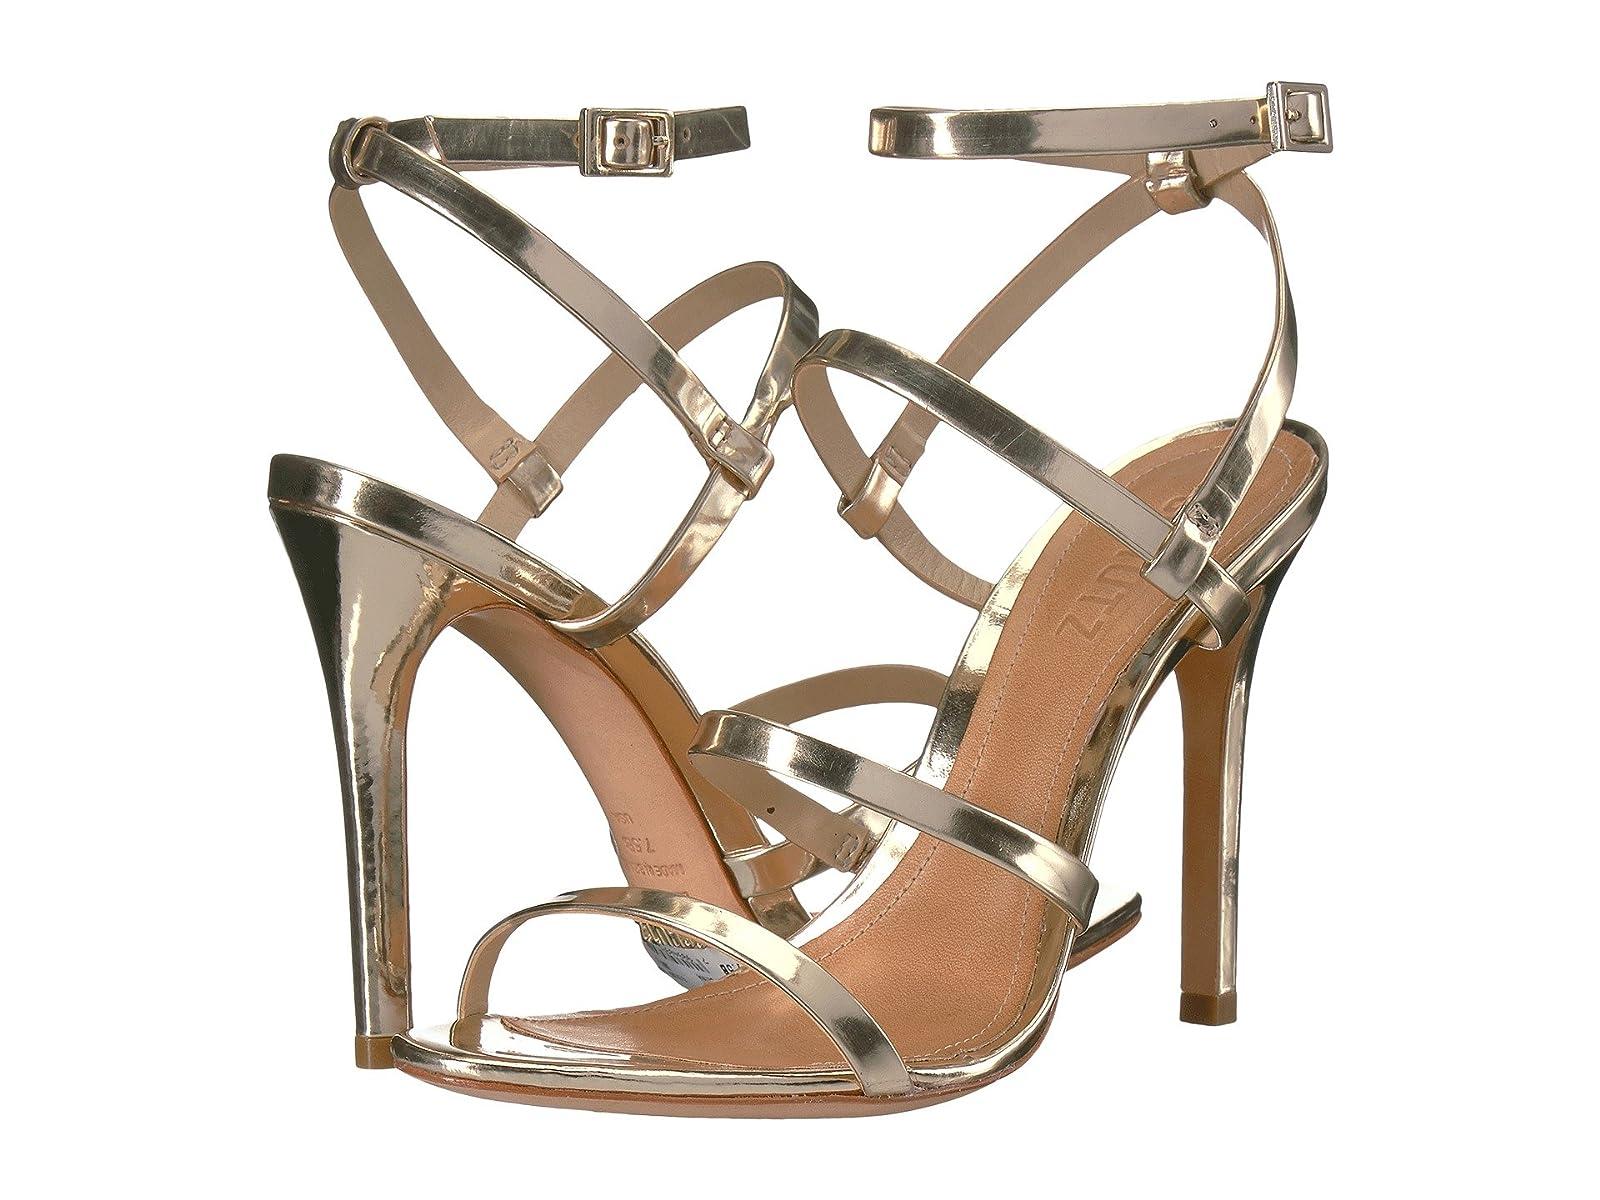 Schutz IlaraAtmospheric grades have affordable shoes